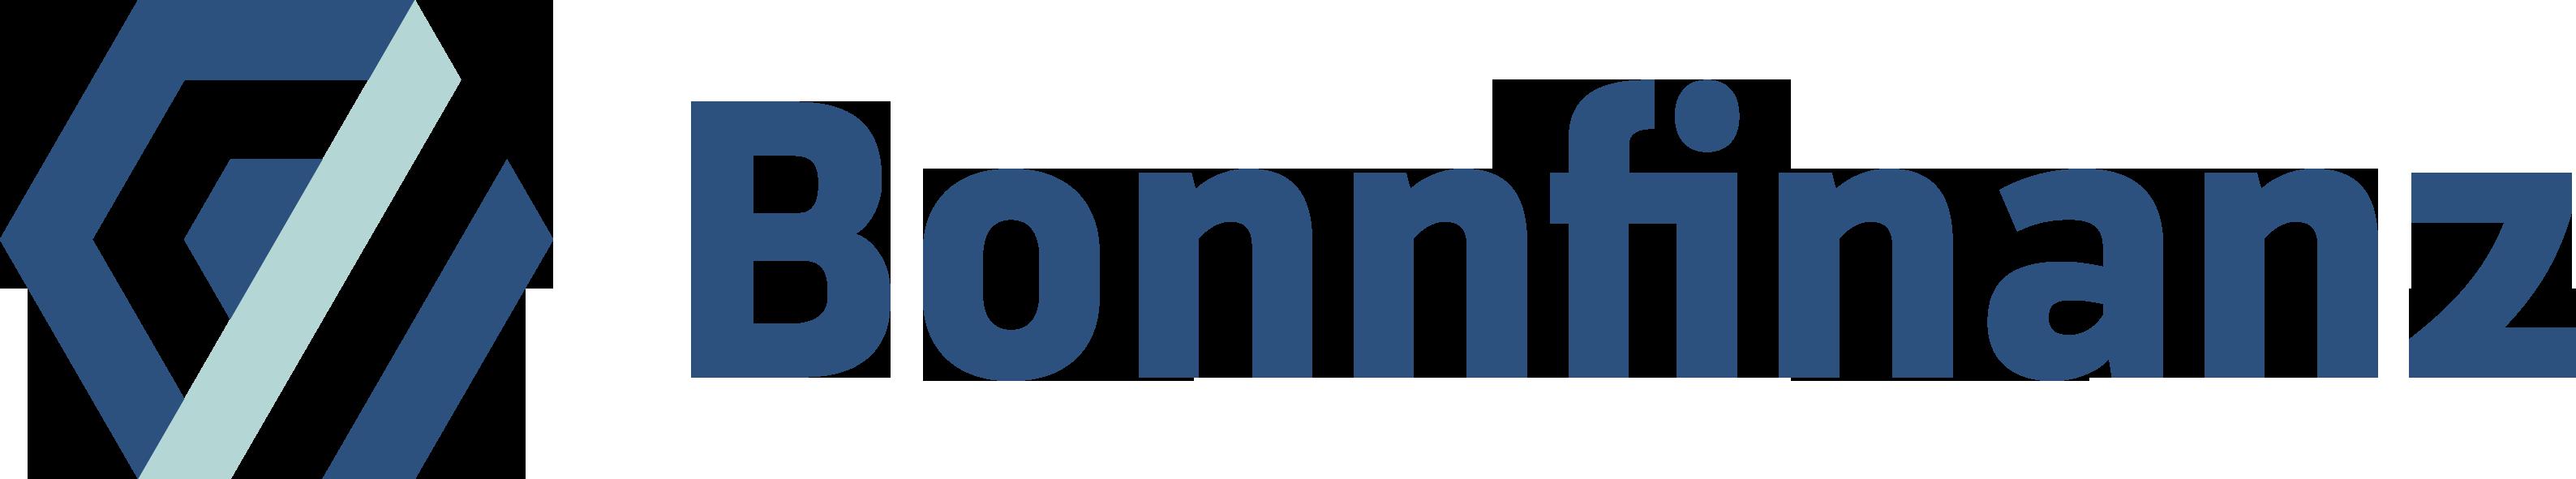 logo bonnfinanz